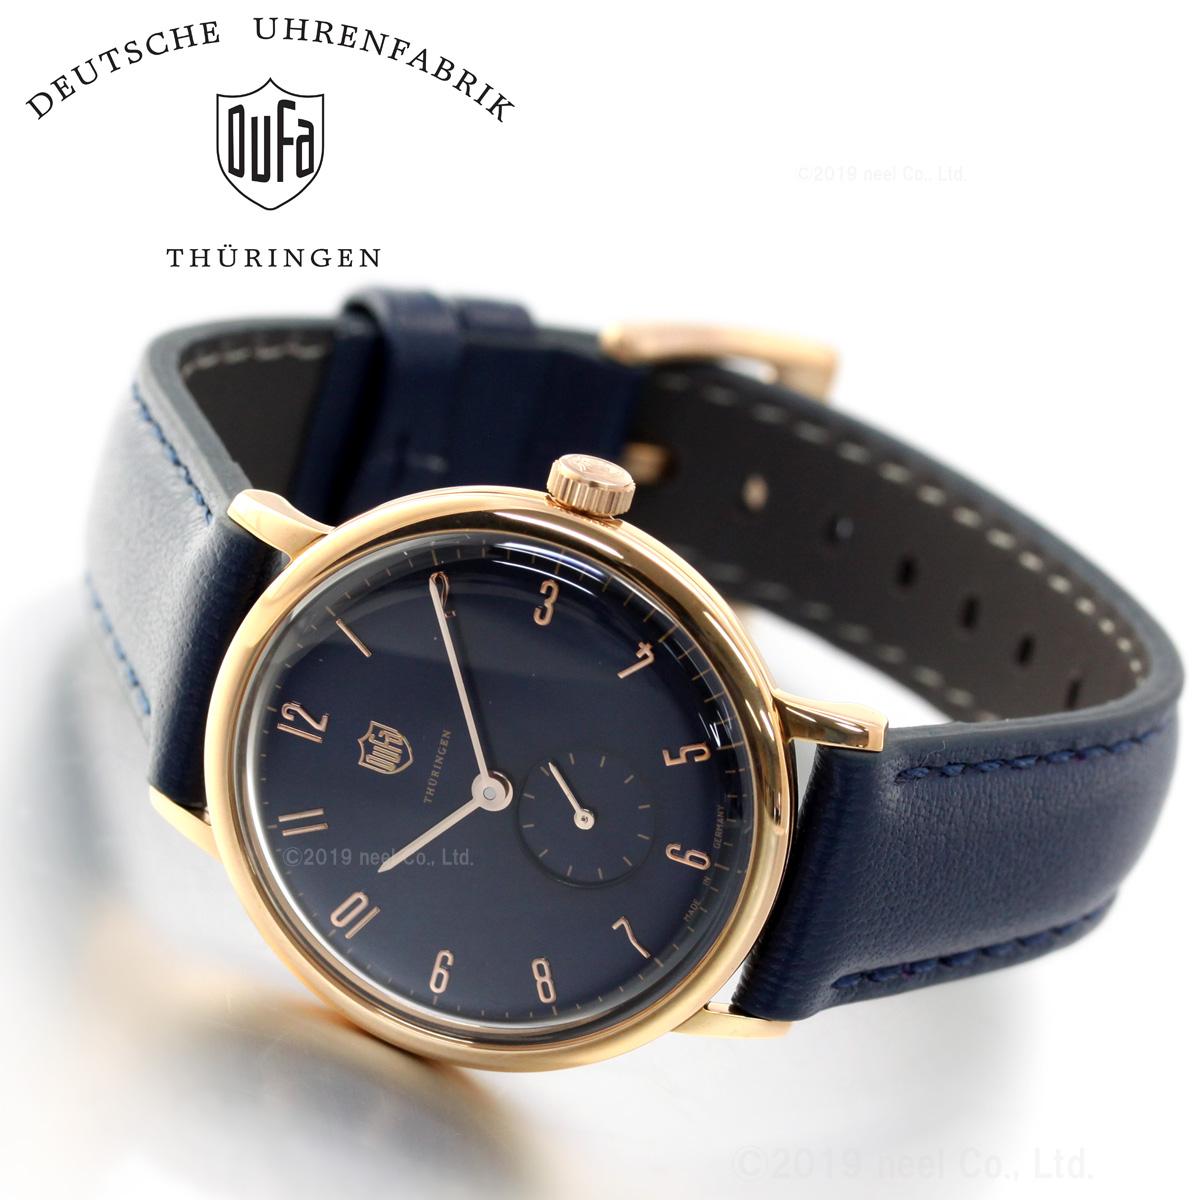 DUFA ドゥッファ 腕時計 レディース グロピウス GROPIUS DF-7001-0F